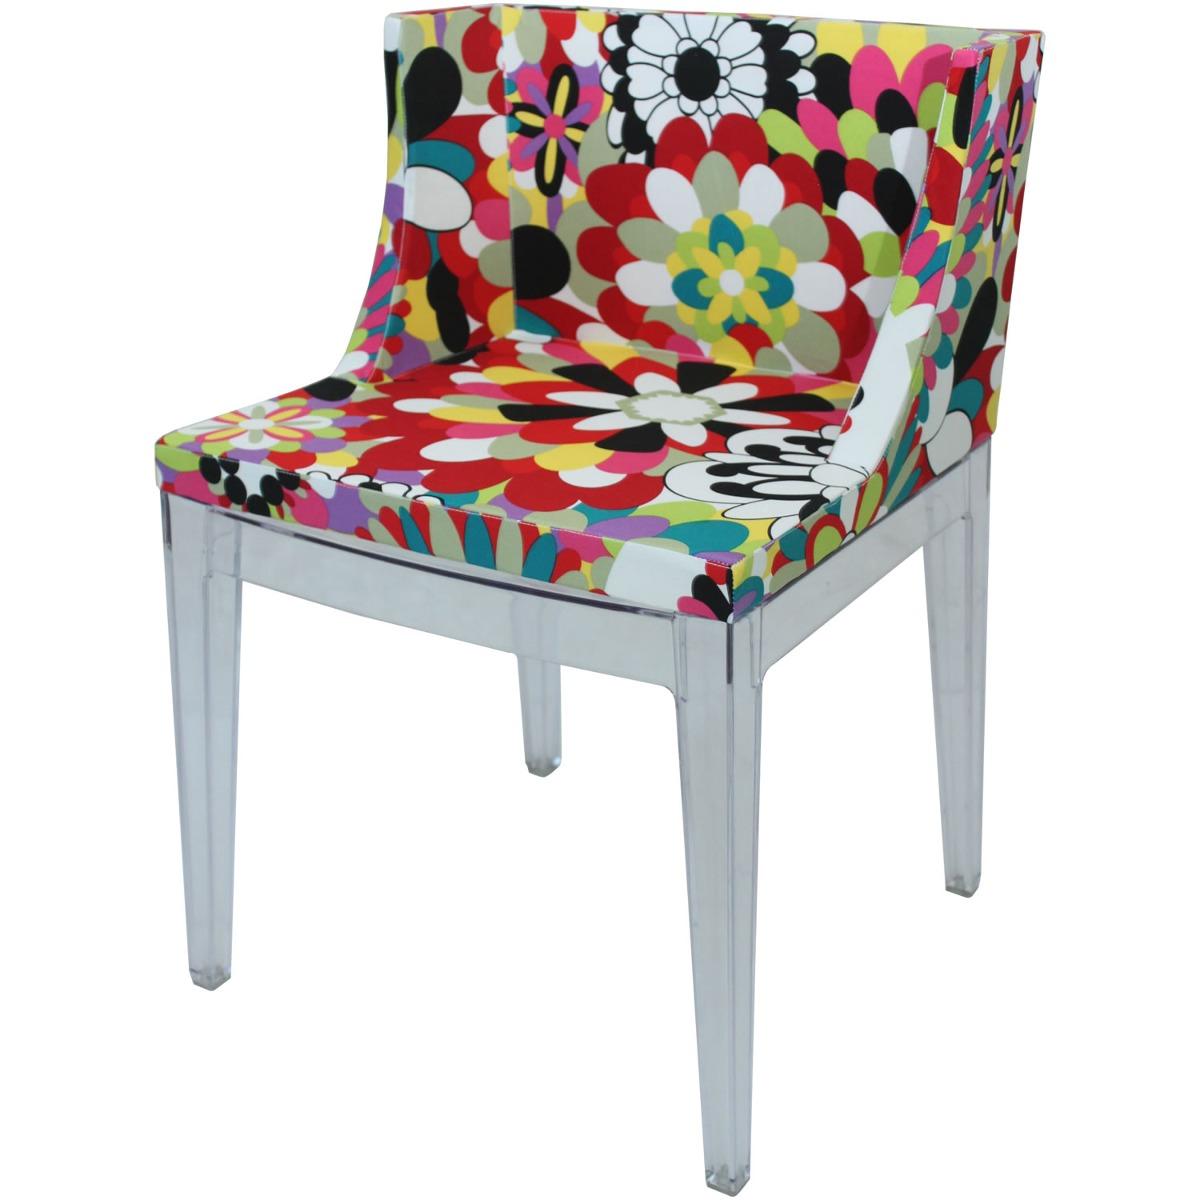 Cadeira Mademoiselle Philippe Starck Tecido Floral R$ 1.079 90 em  #AB2024 1200x1200